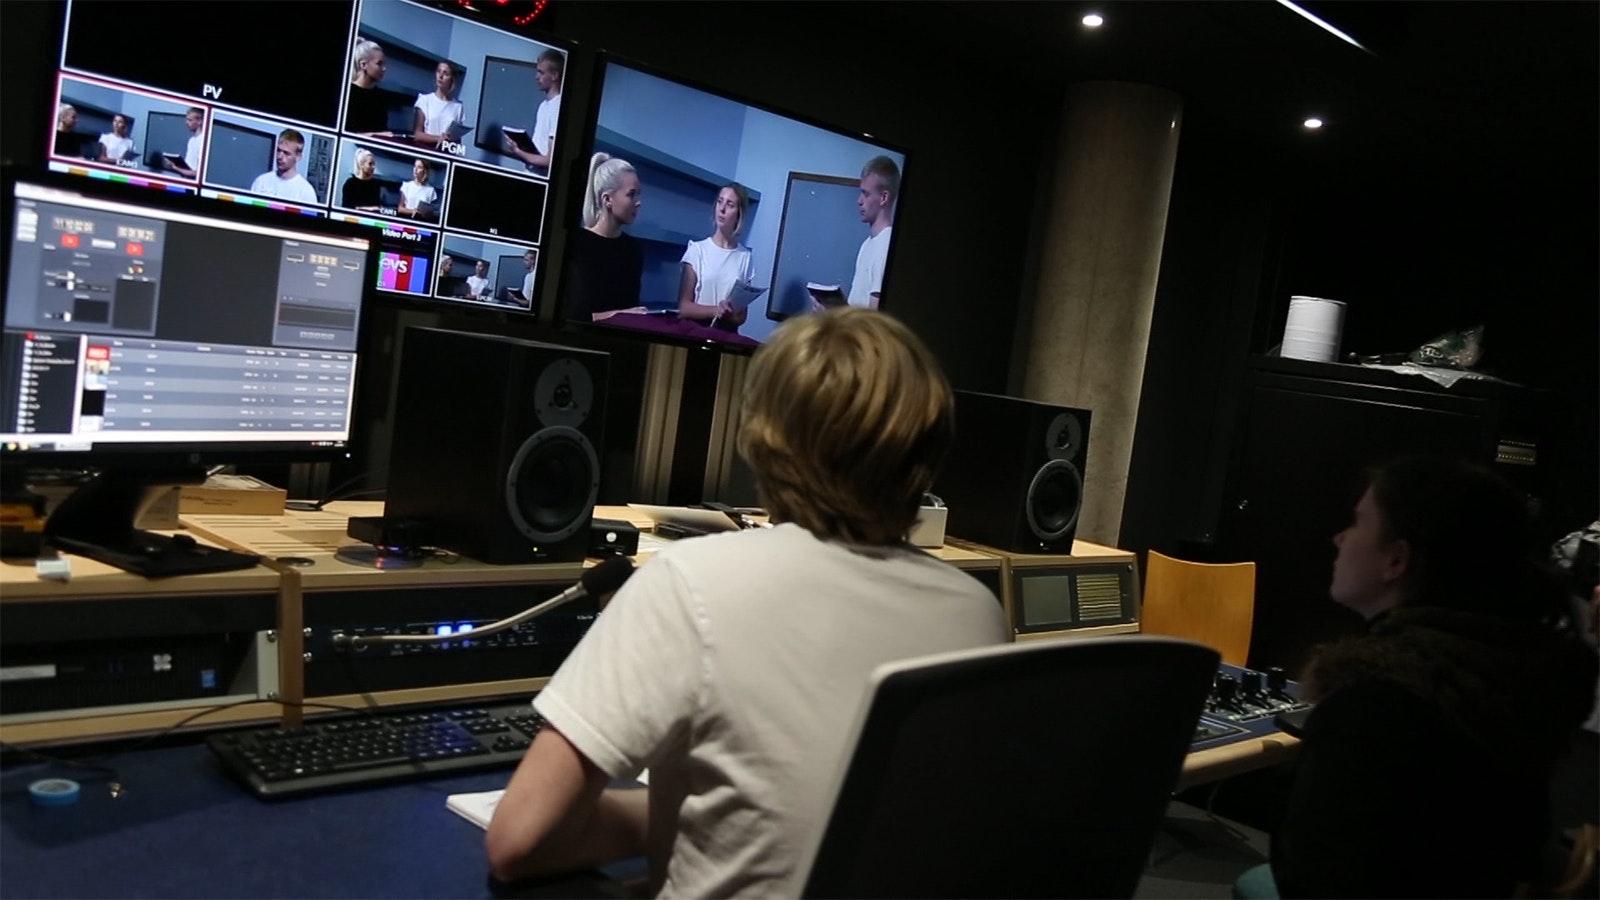 Media and Performance Film Screening